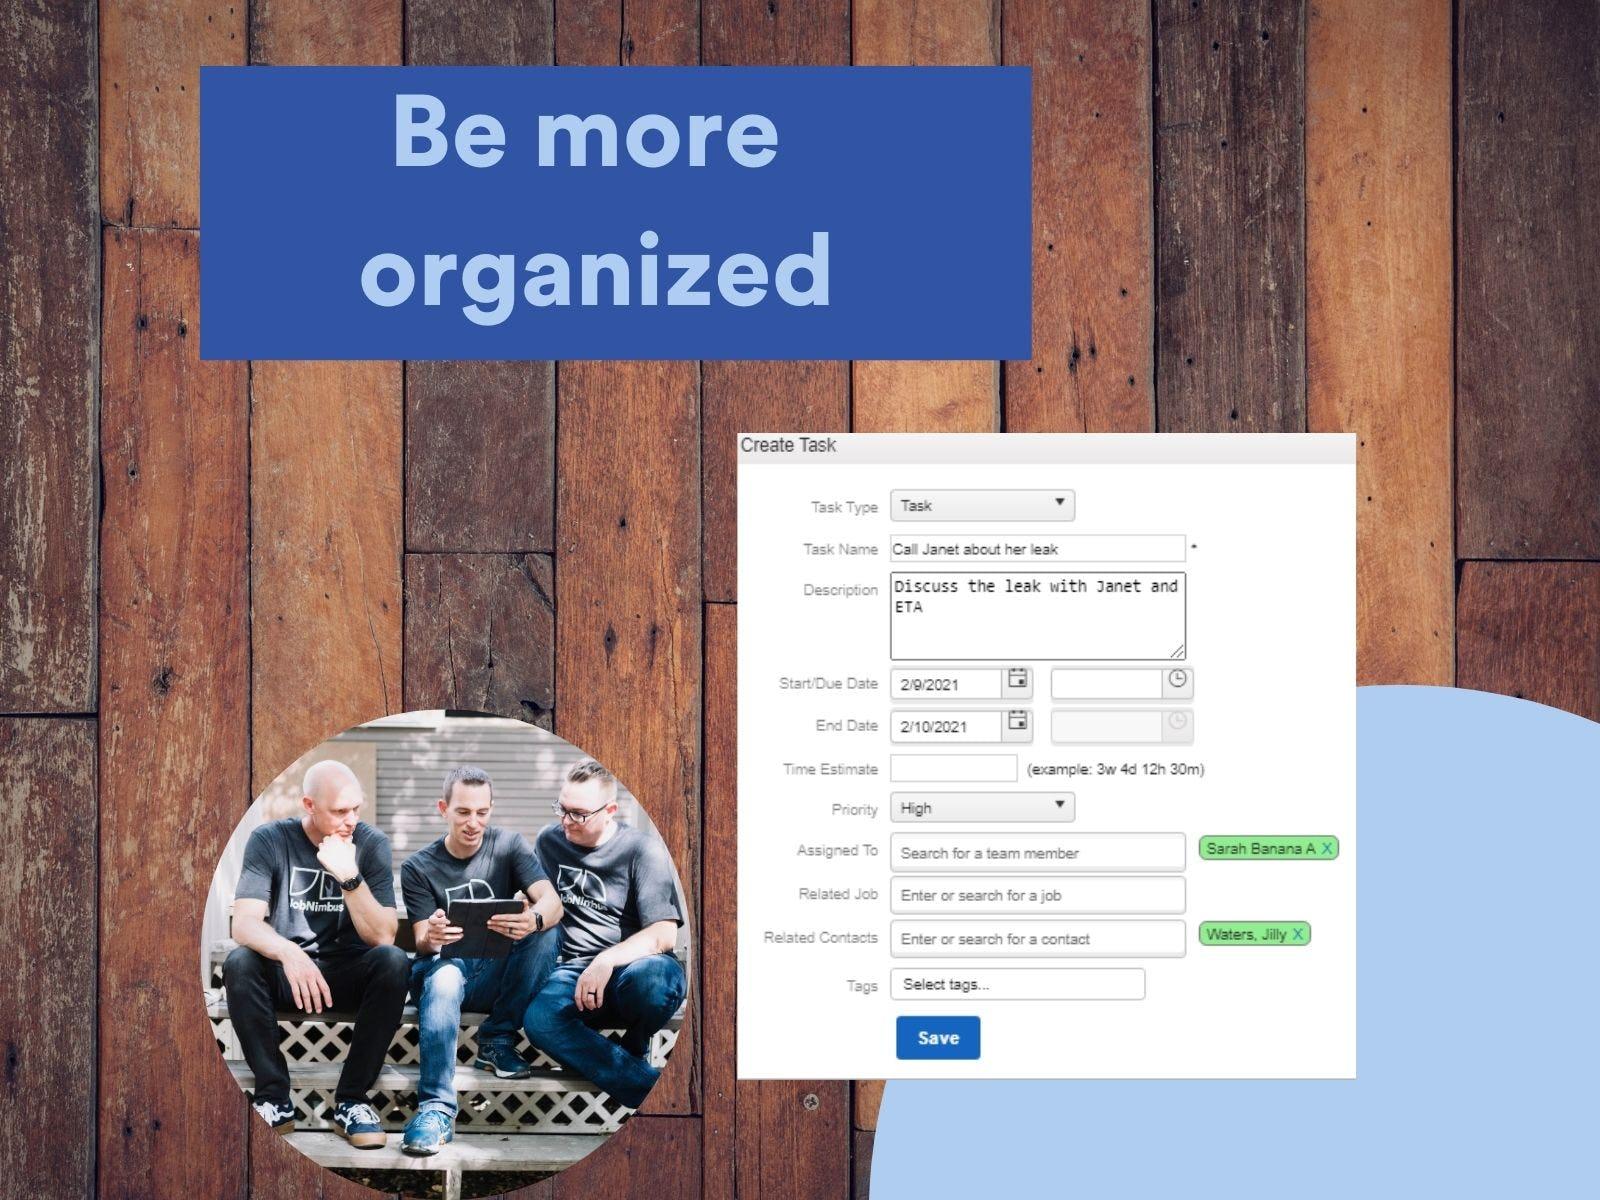 JobNimbus Software - Be More Organized with JobNimbus